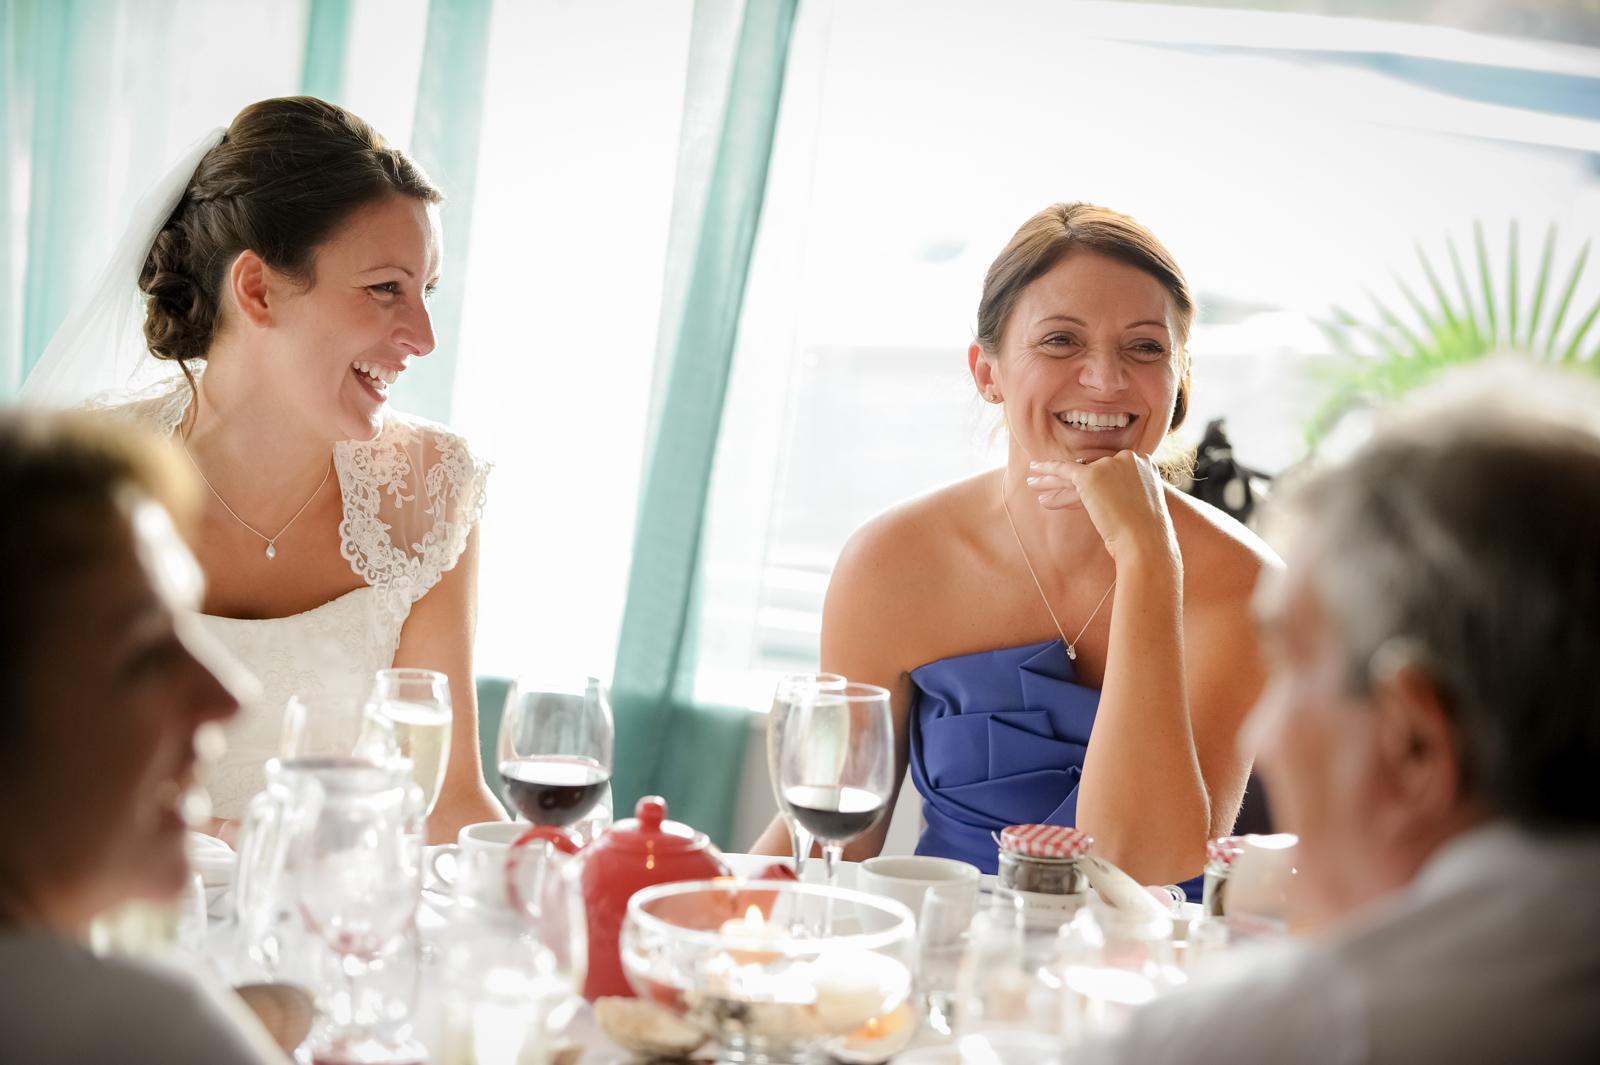 watergate-bay-hotel-wedding-photography-85.jpg